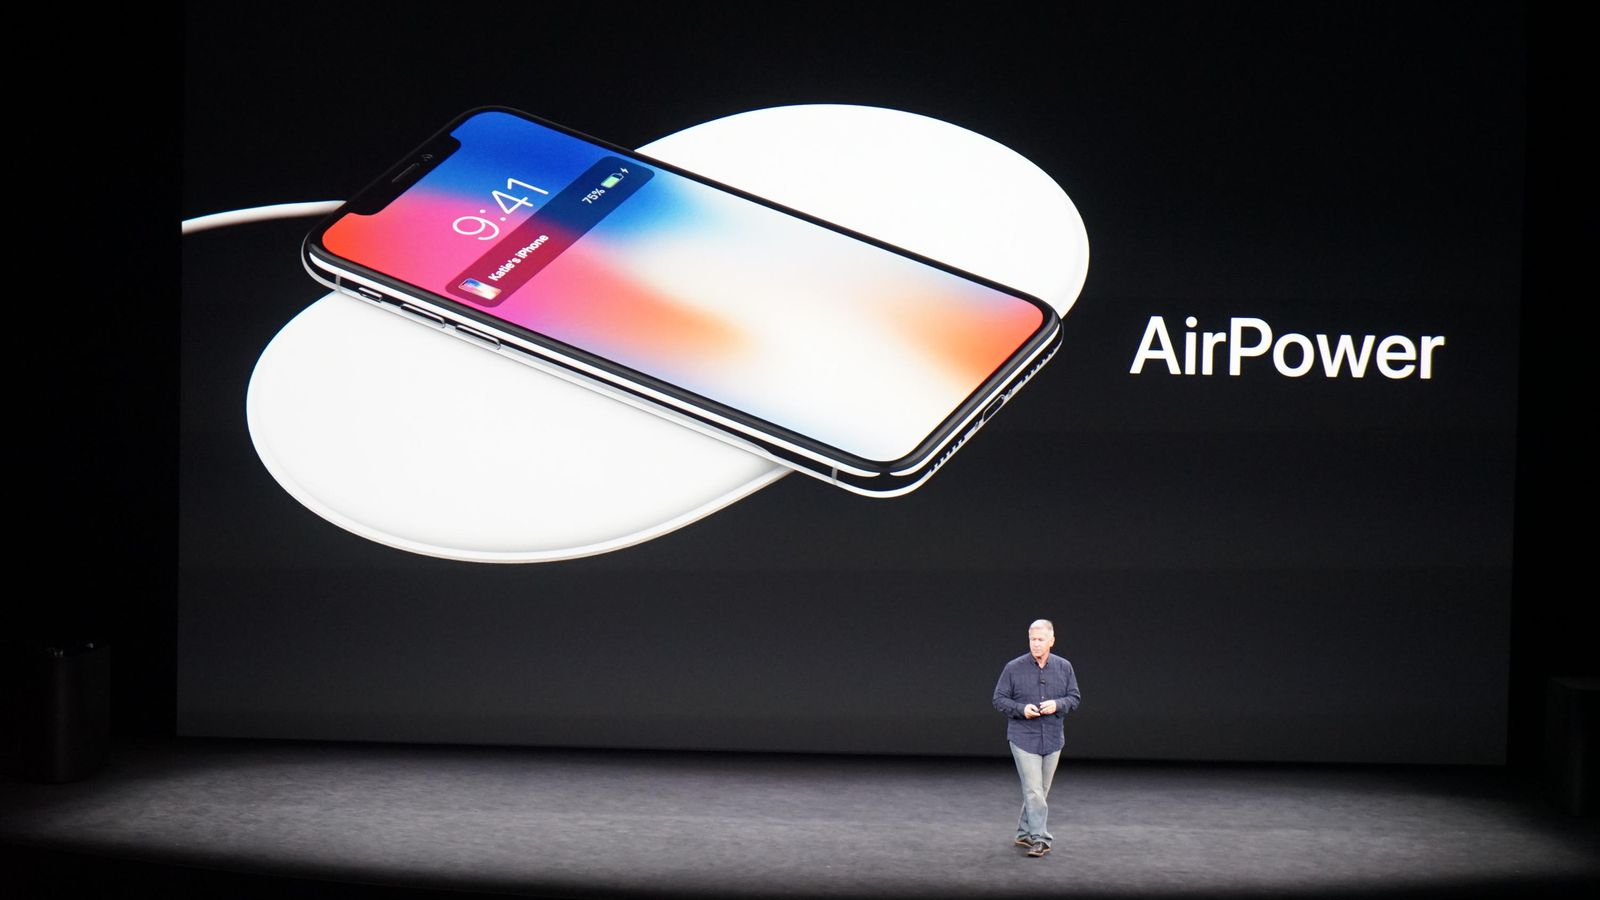 AirPower, ami egy álom marad